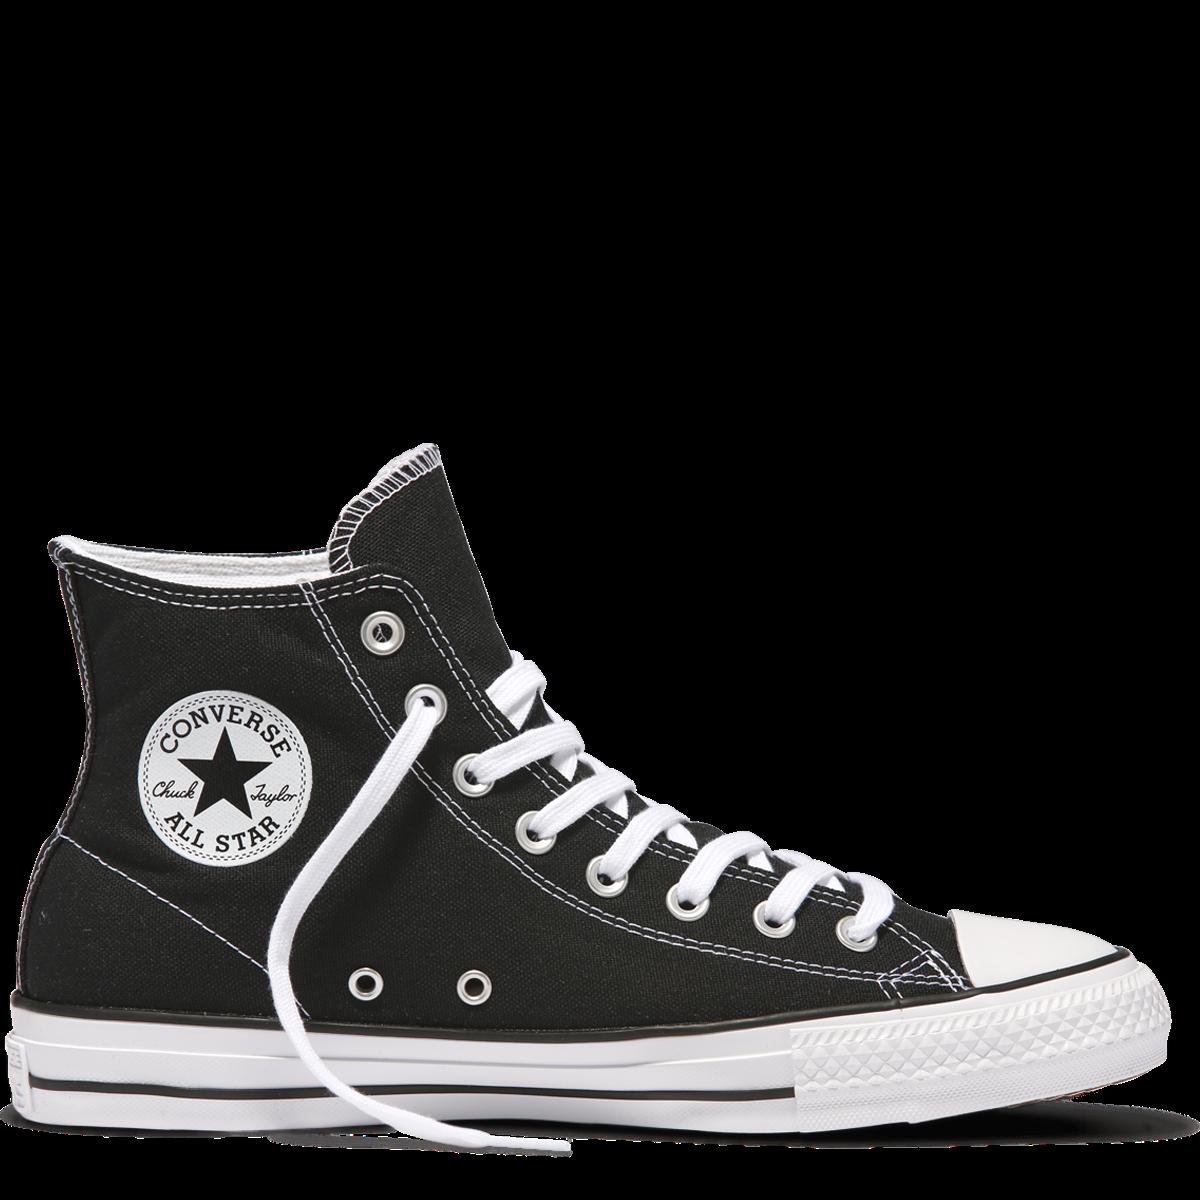 Converse Chuck Taylor All Star Suede botas   zapatos. Talla 7-13. NIB,   129.99.